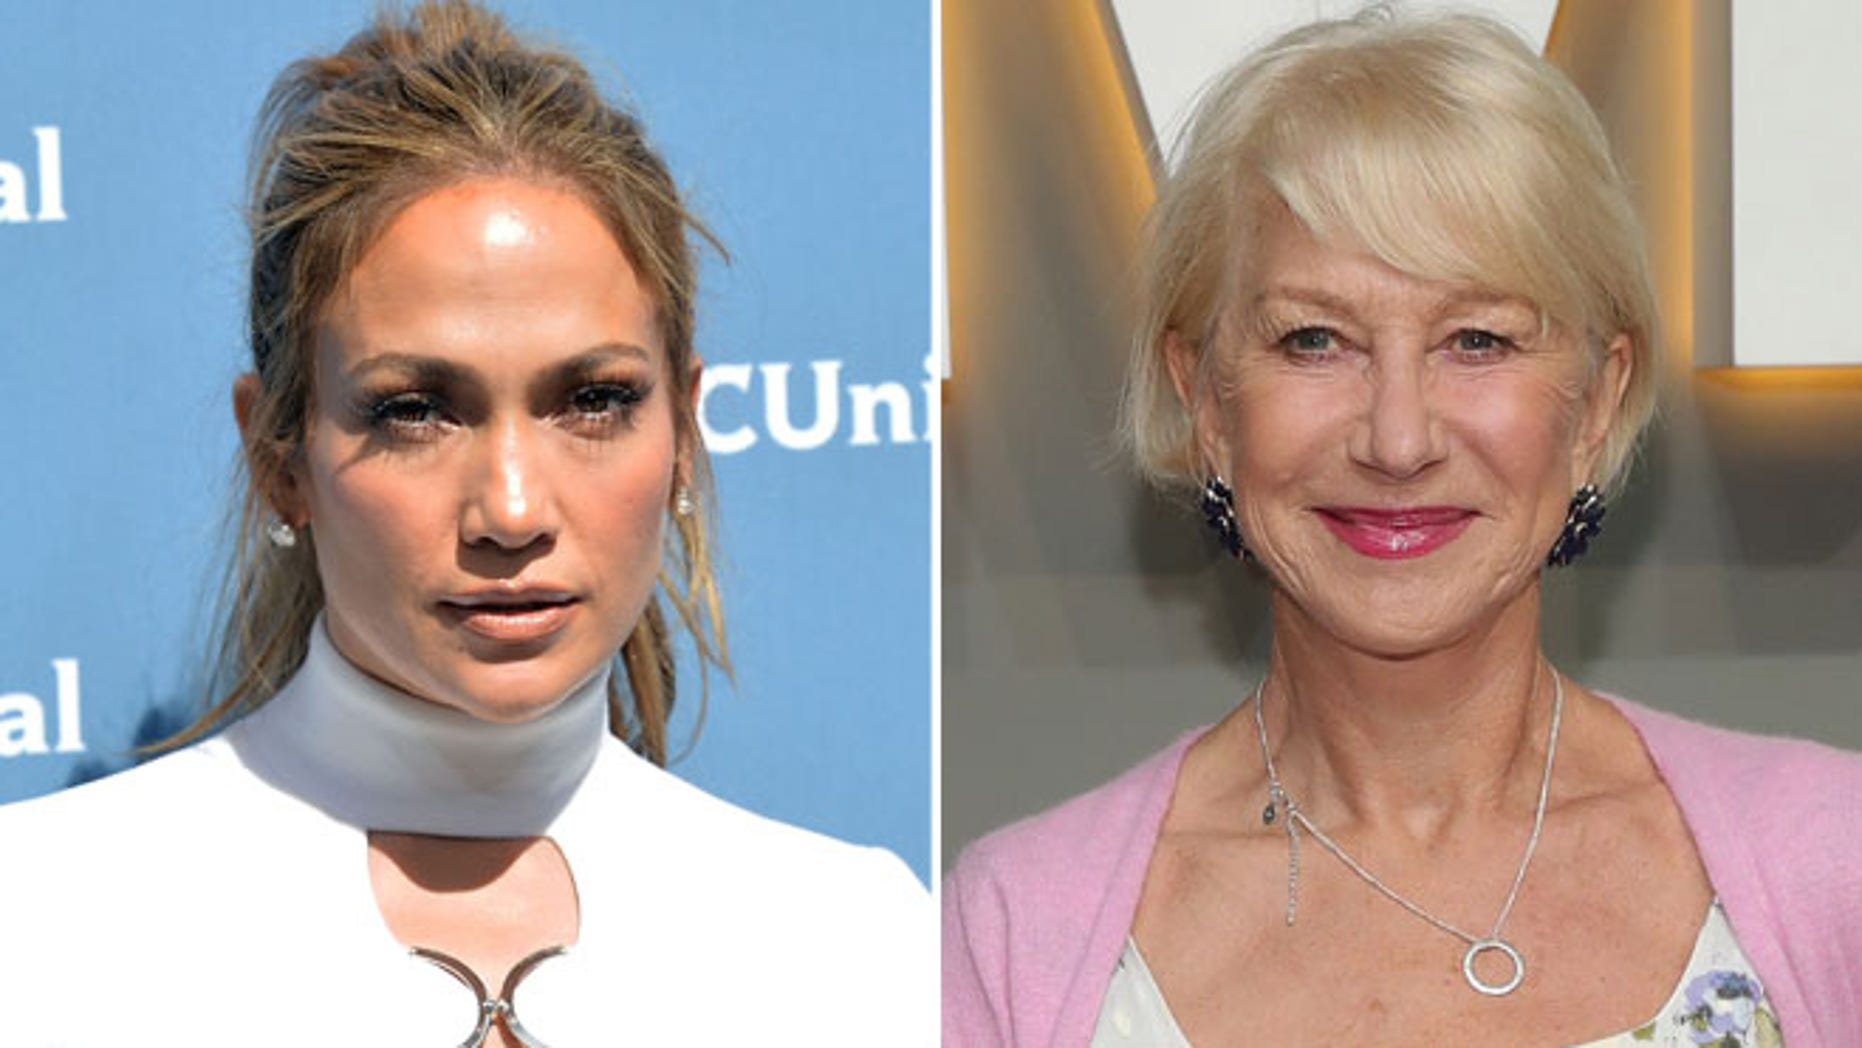 Jennifer Lopez (left) and Helen Mirren. (Photos: Getty Images)